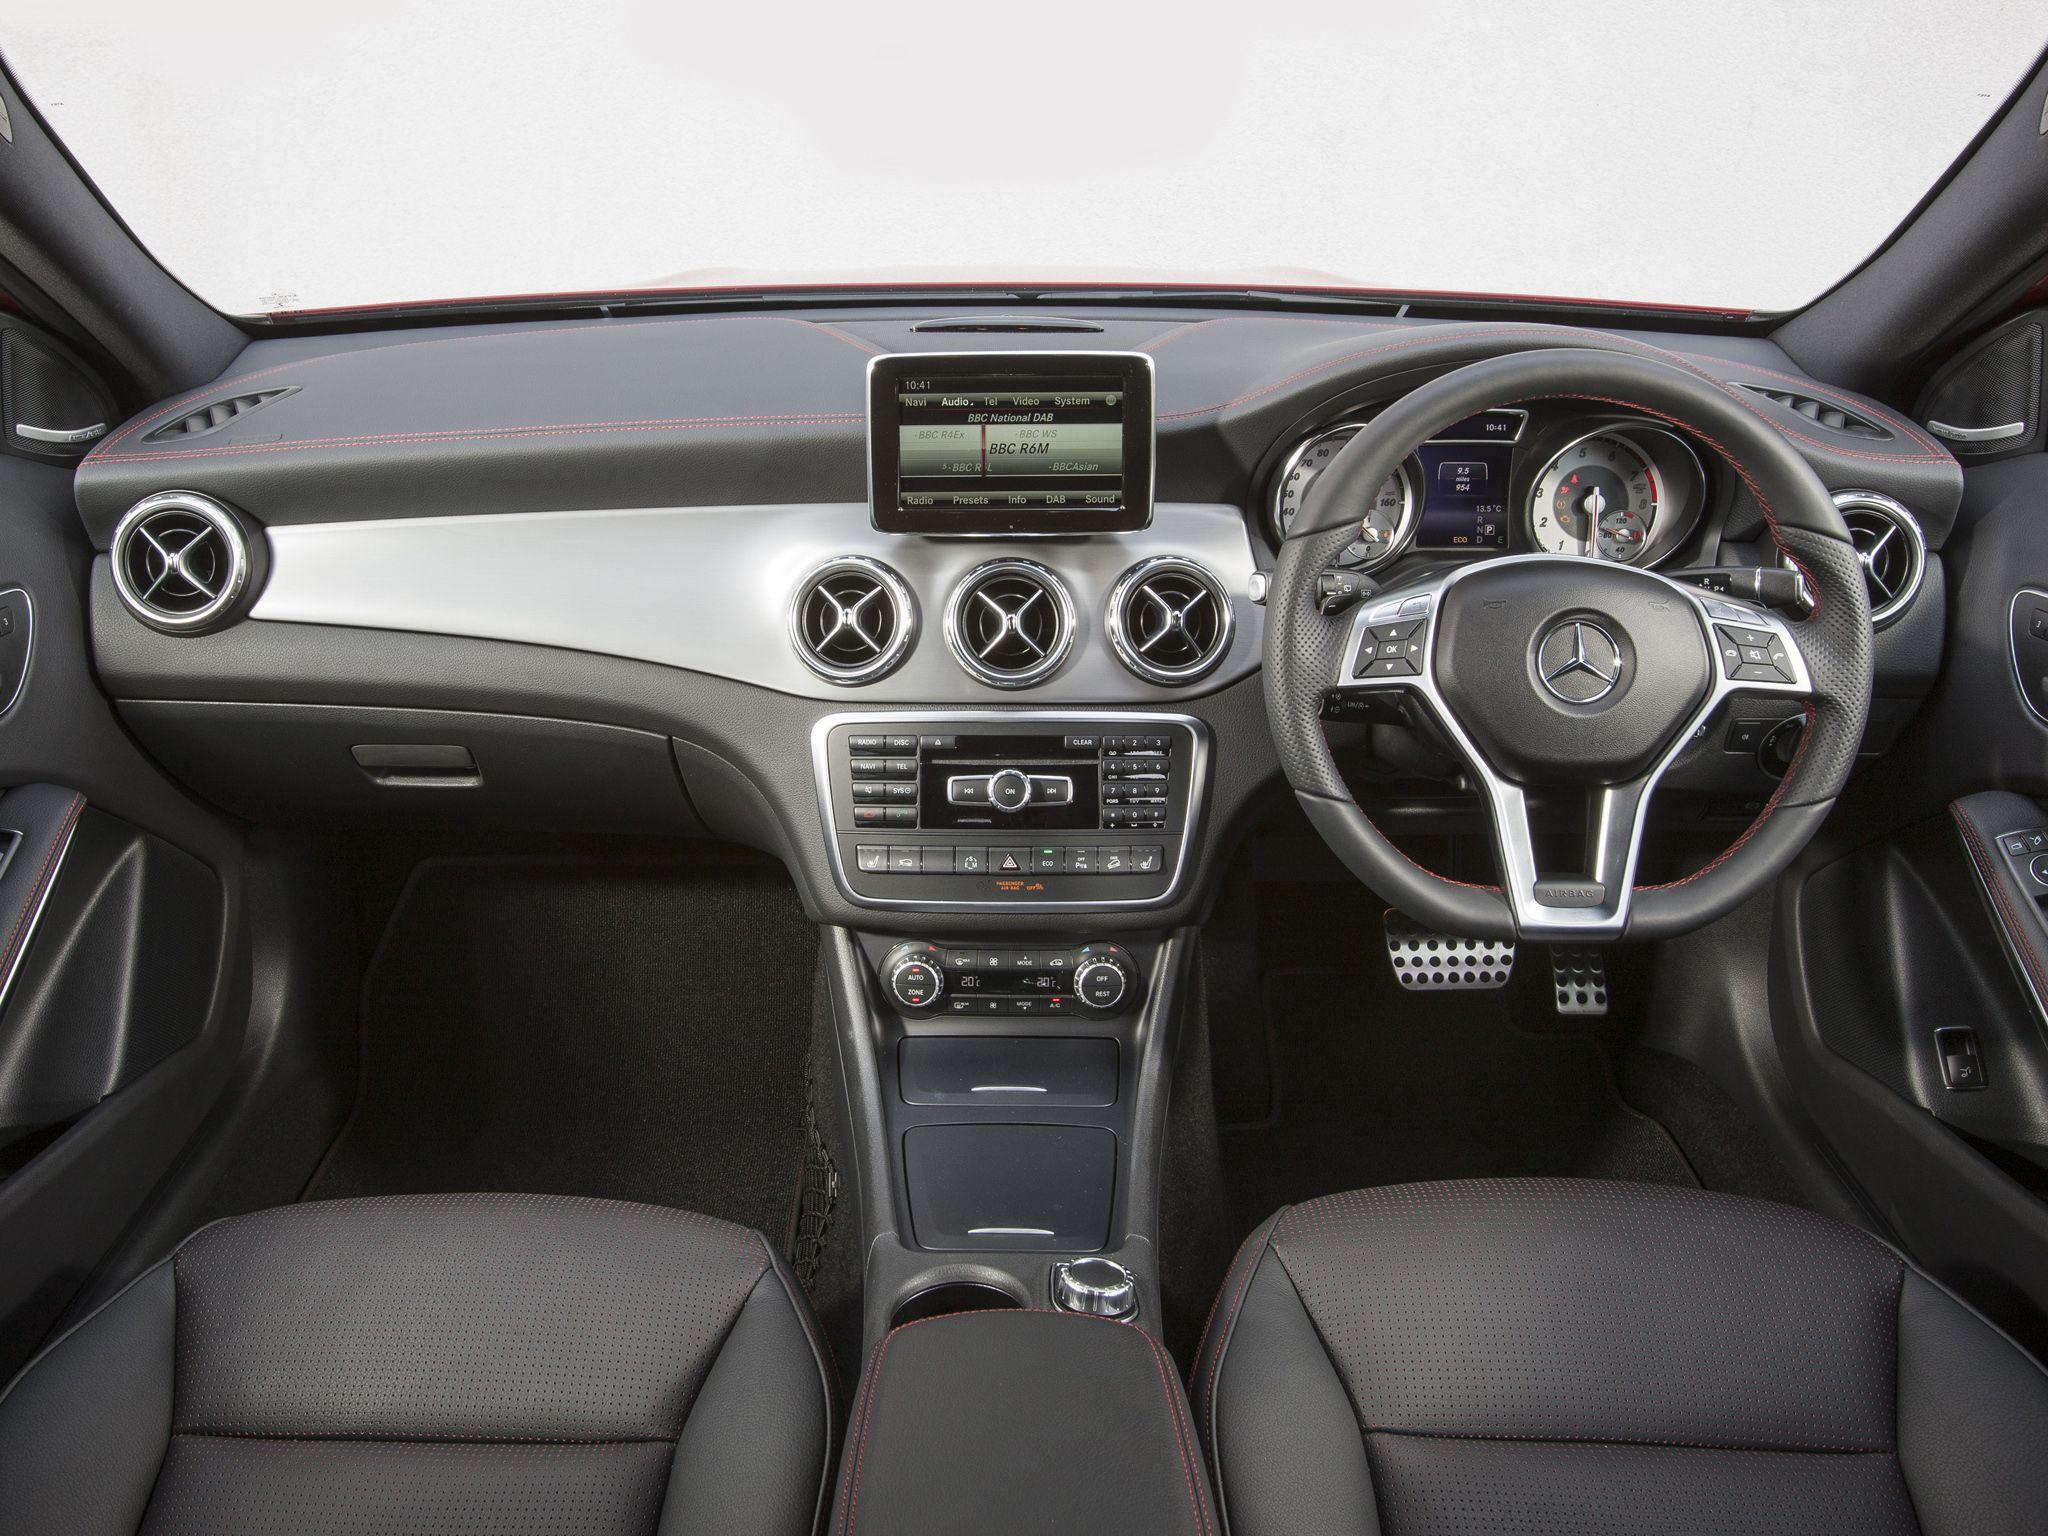 Mercedes Benz Gla 250 4matic Amg Line Uk Spec X156 2014 17 Mercedes Benz Gla Mercedes Benz